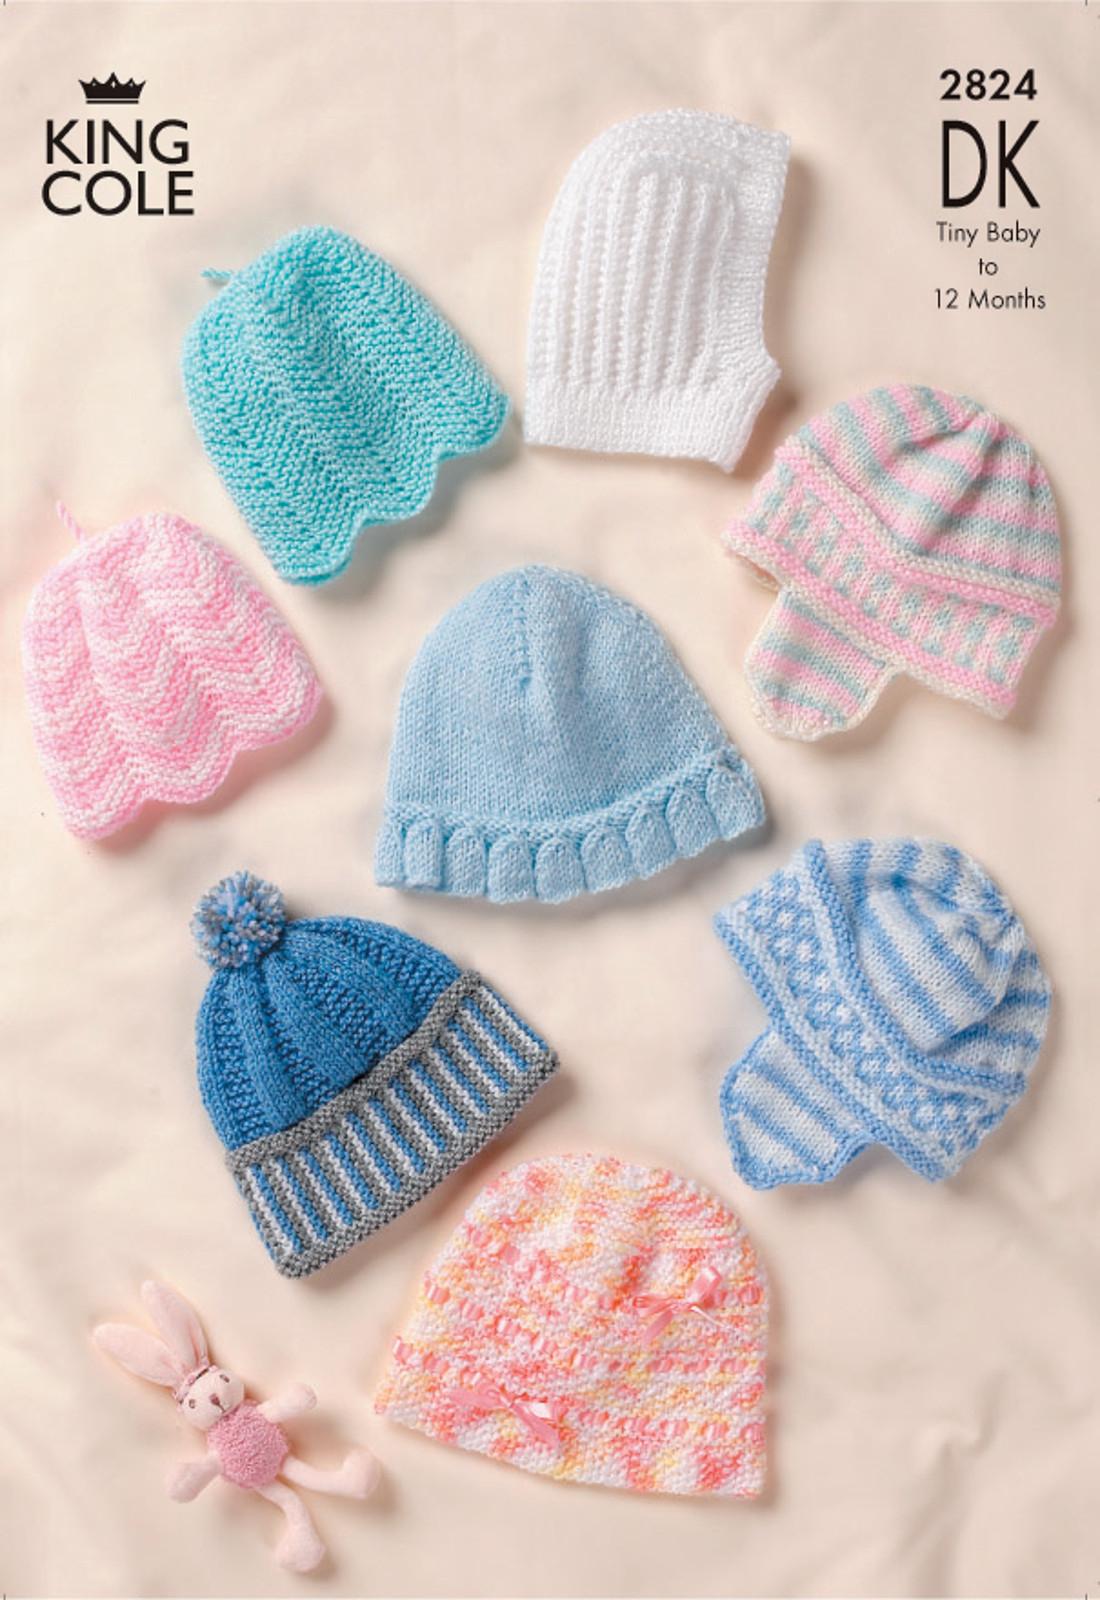 Knitting Pattern Balaclava Details About Ba Dk Double Knitting Pattern King Cole Hats Bobble Hat Balaclava Bonnet 2824